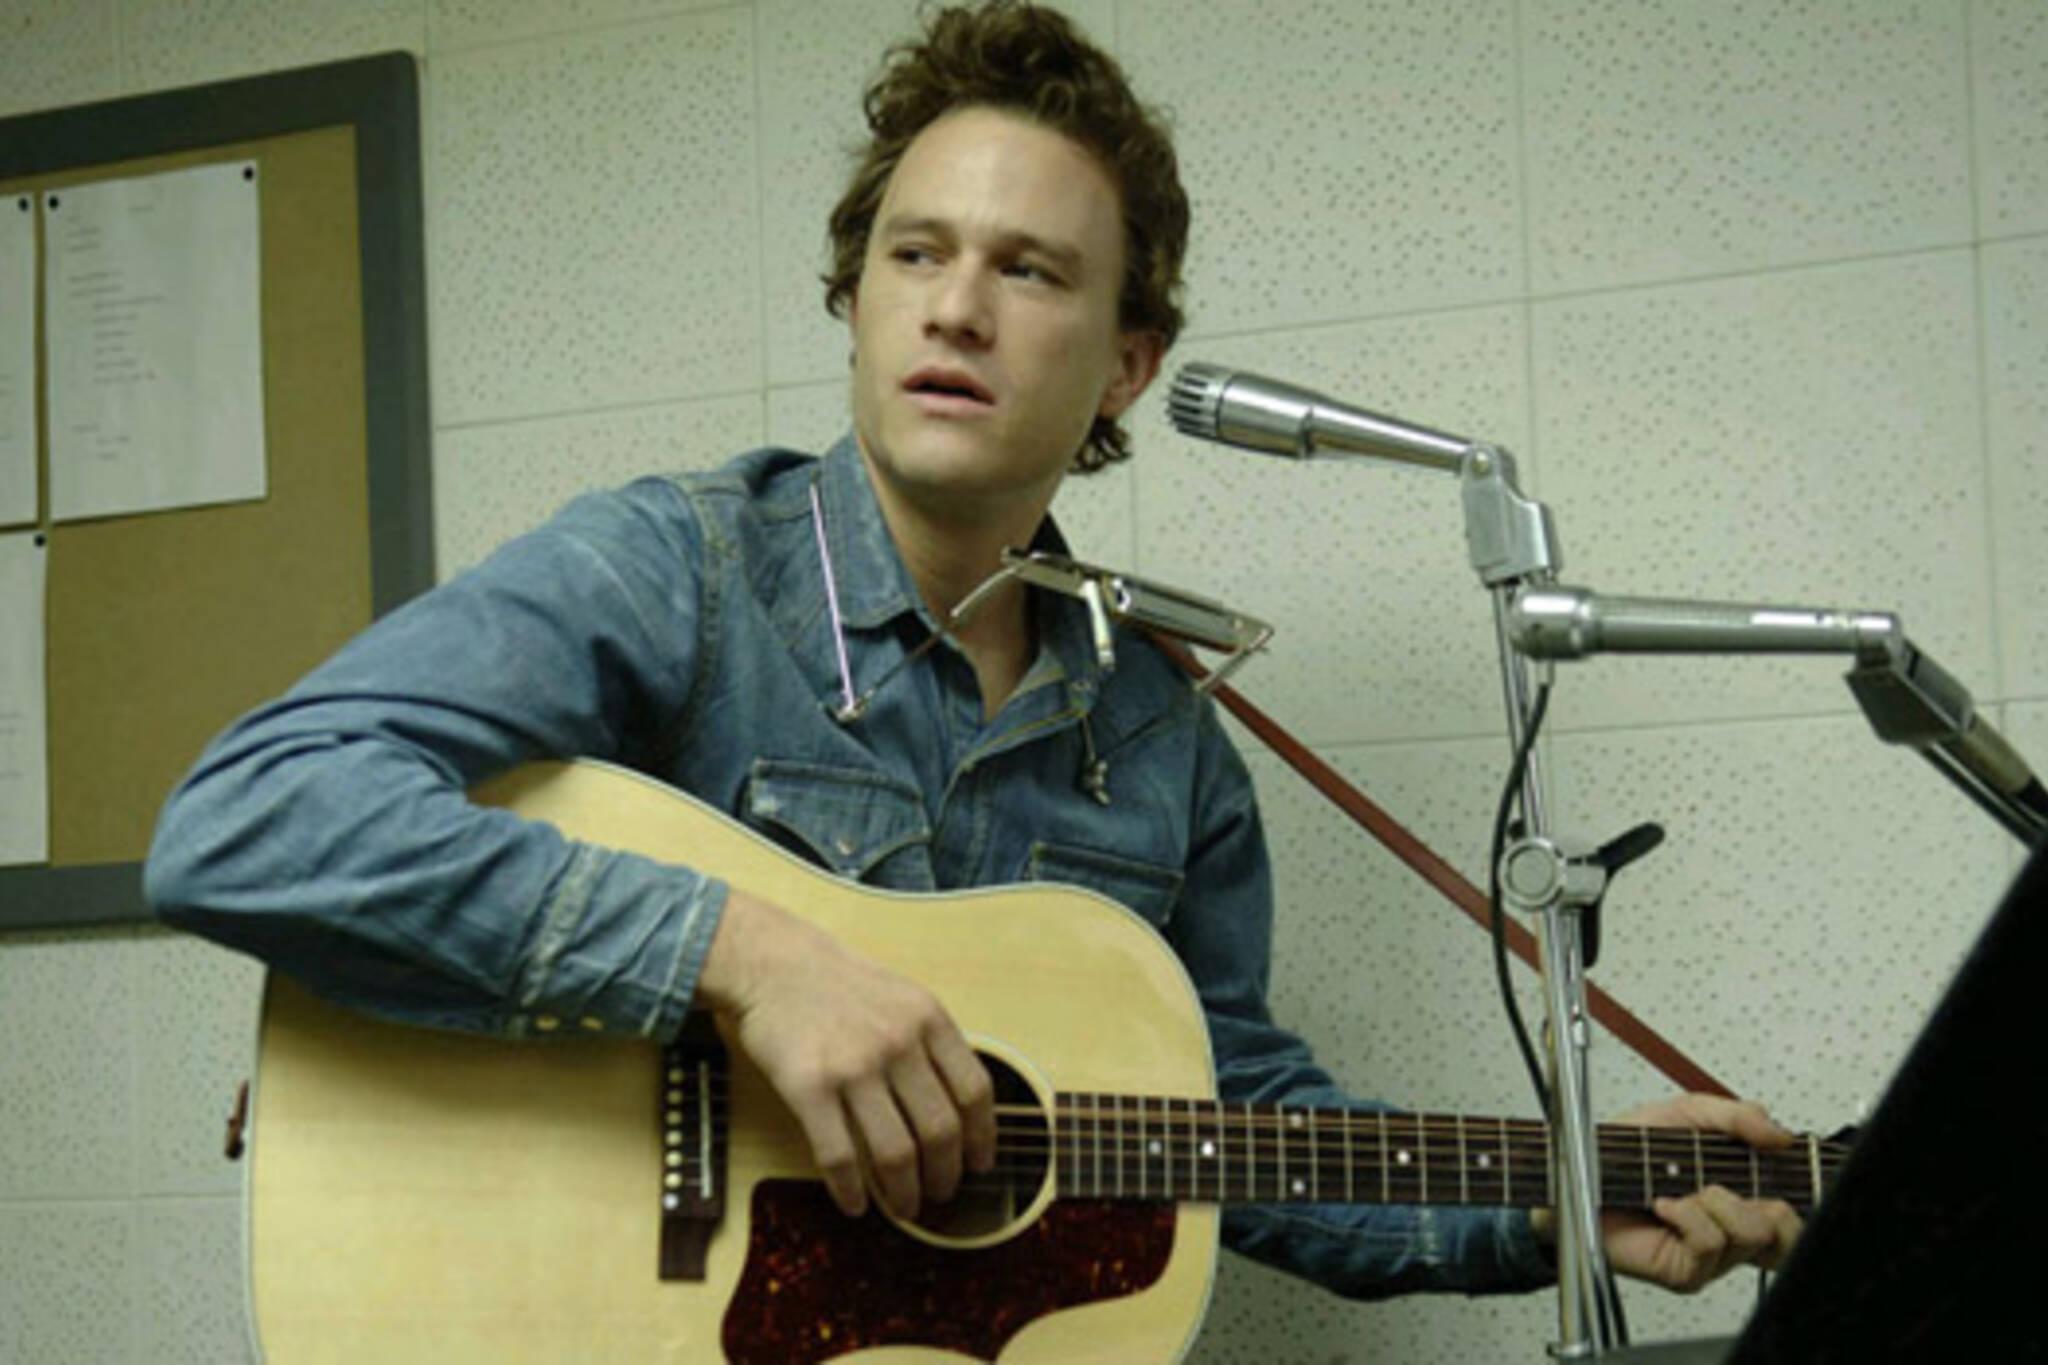 Heath Ledger - I'm Not There